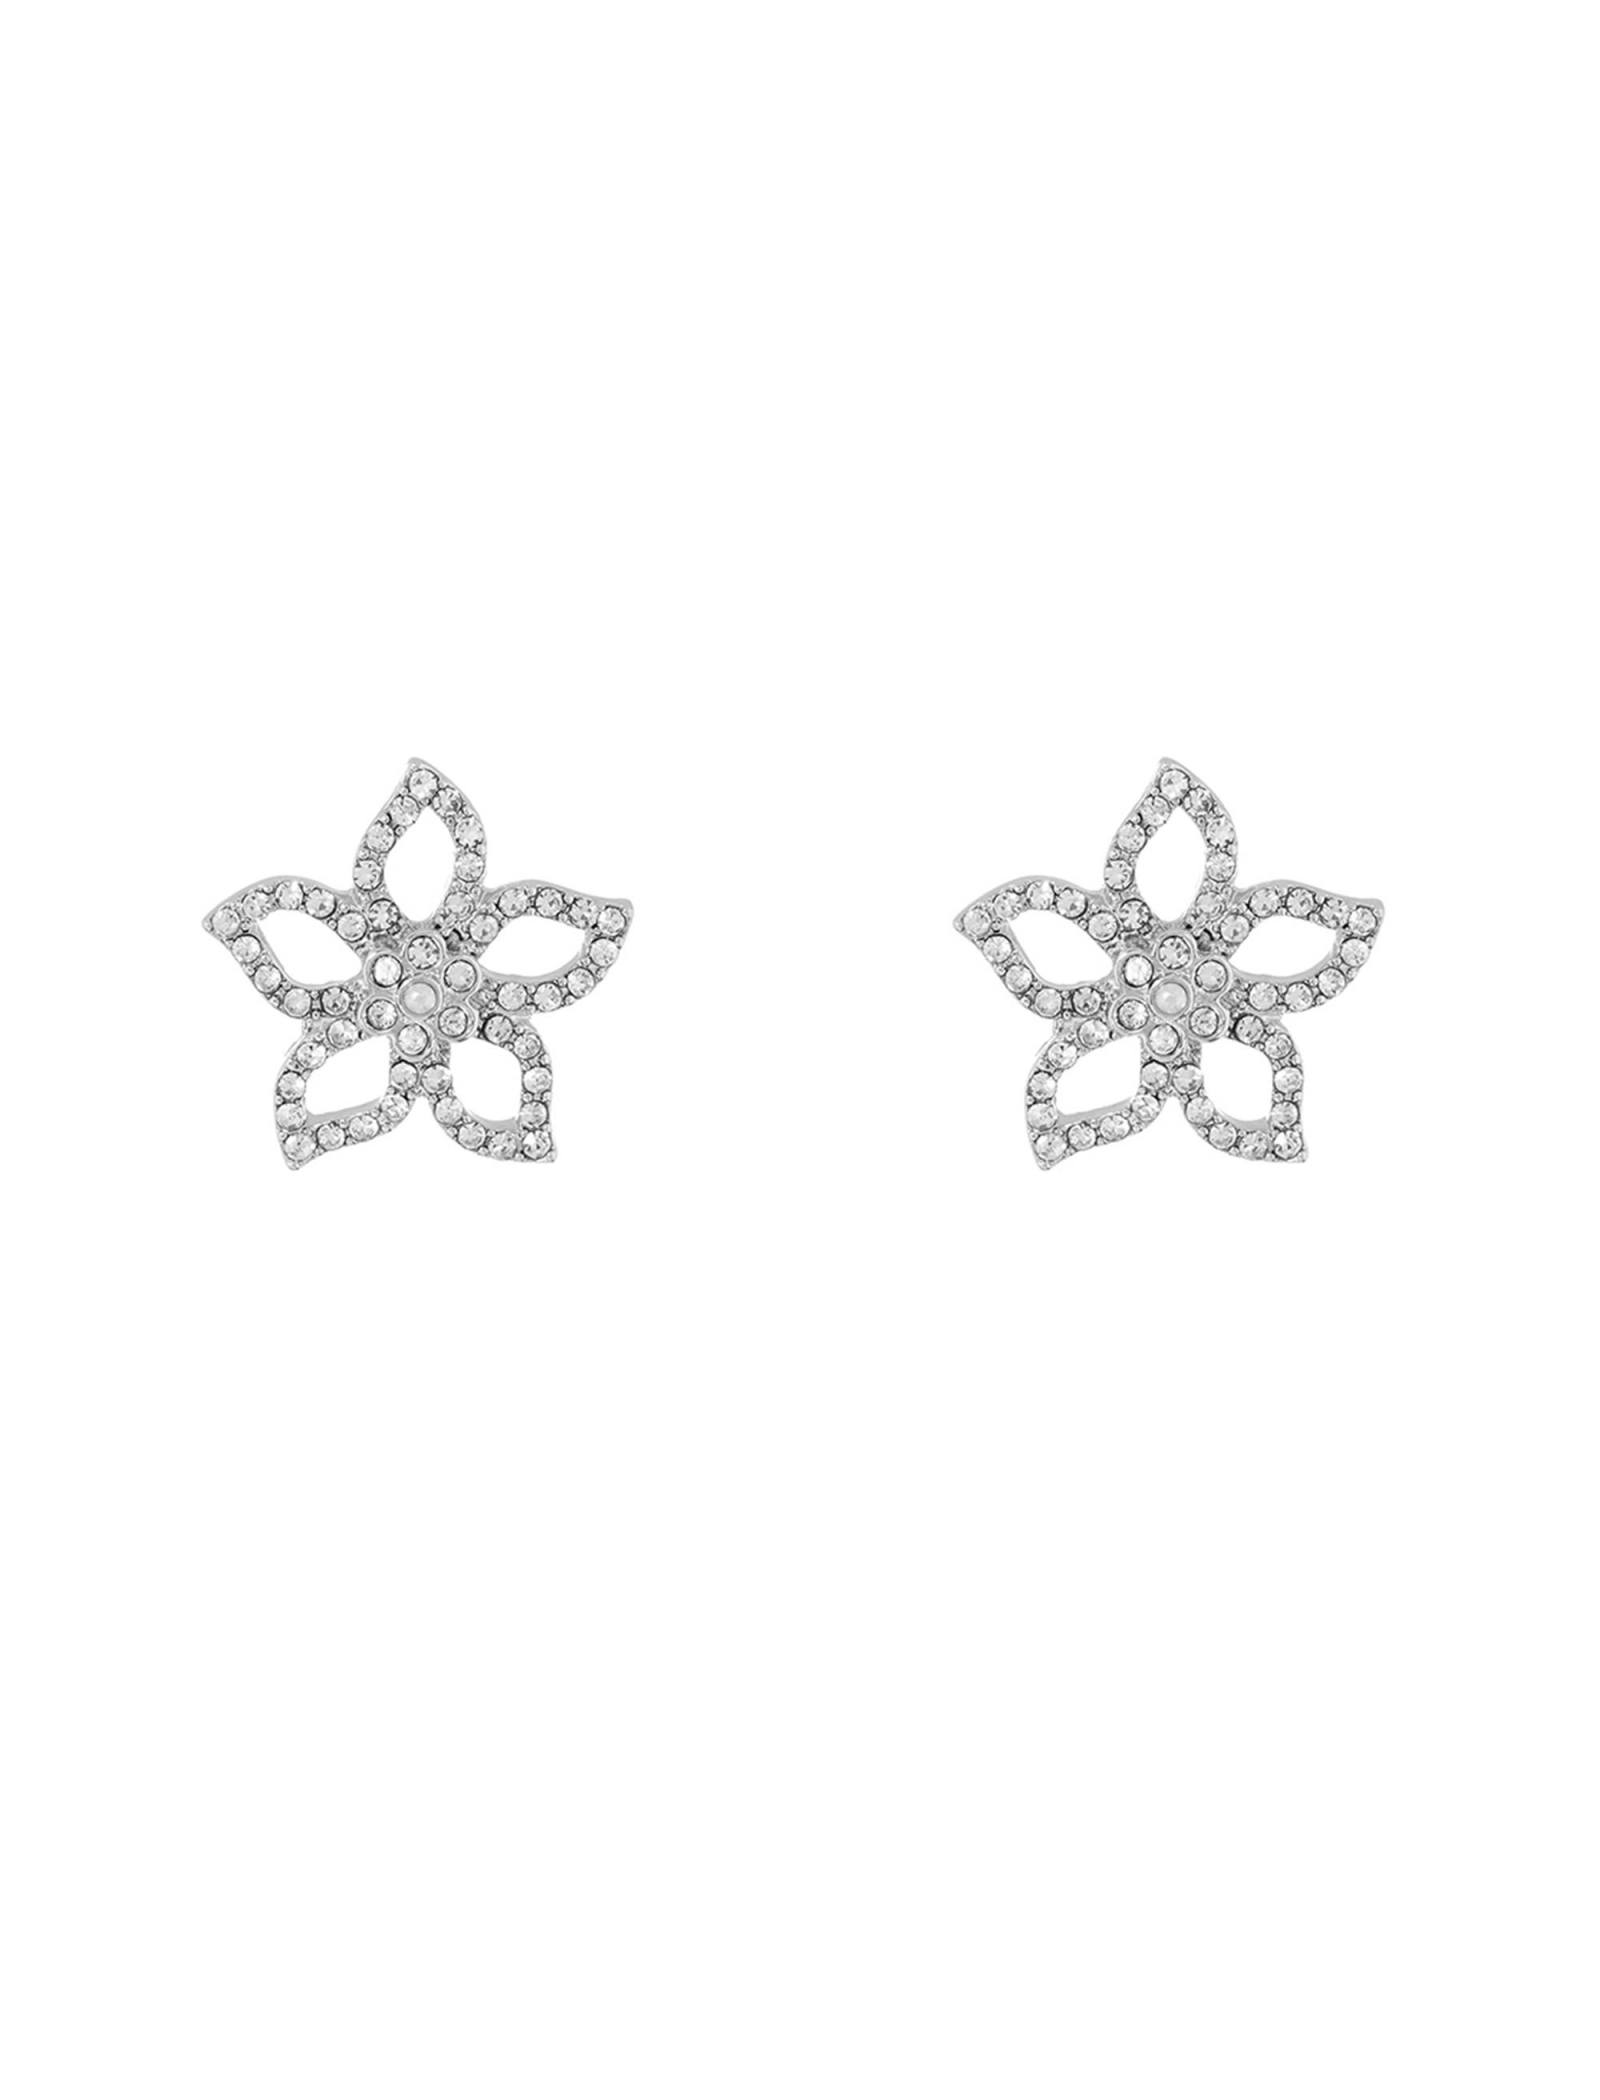 گوشواره میخی زنانه Cut Out Flower Stud - اکسسورایز تک سایز -  - 2